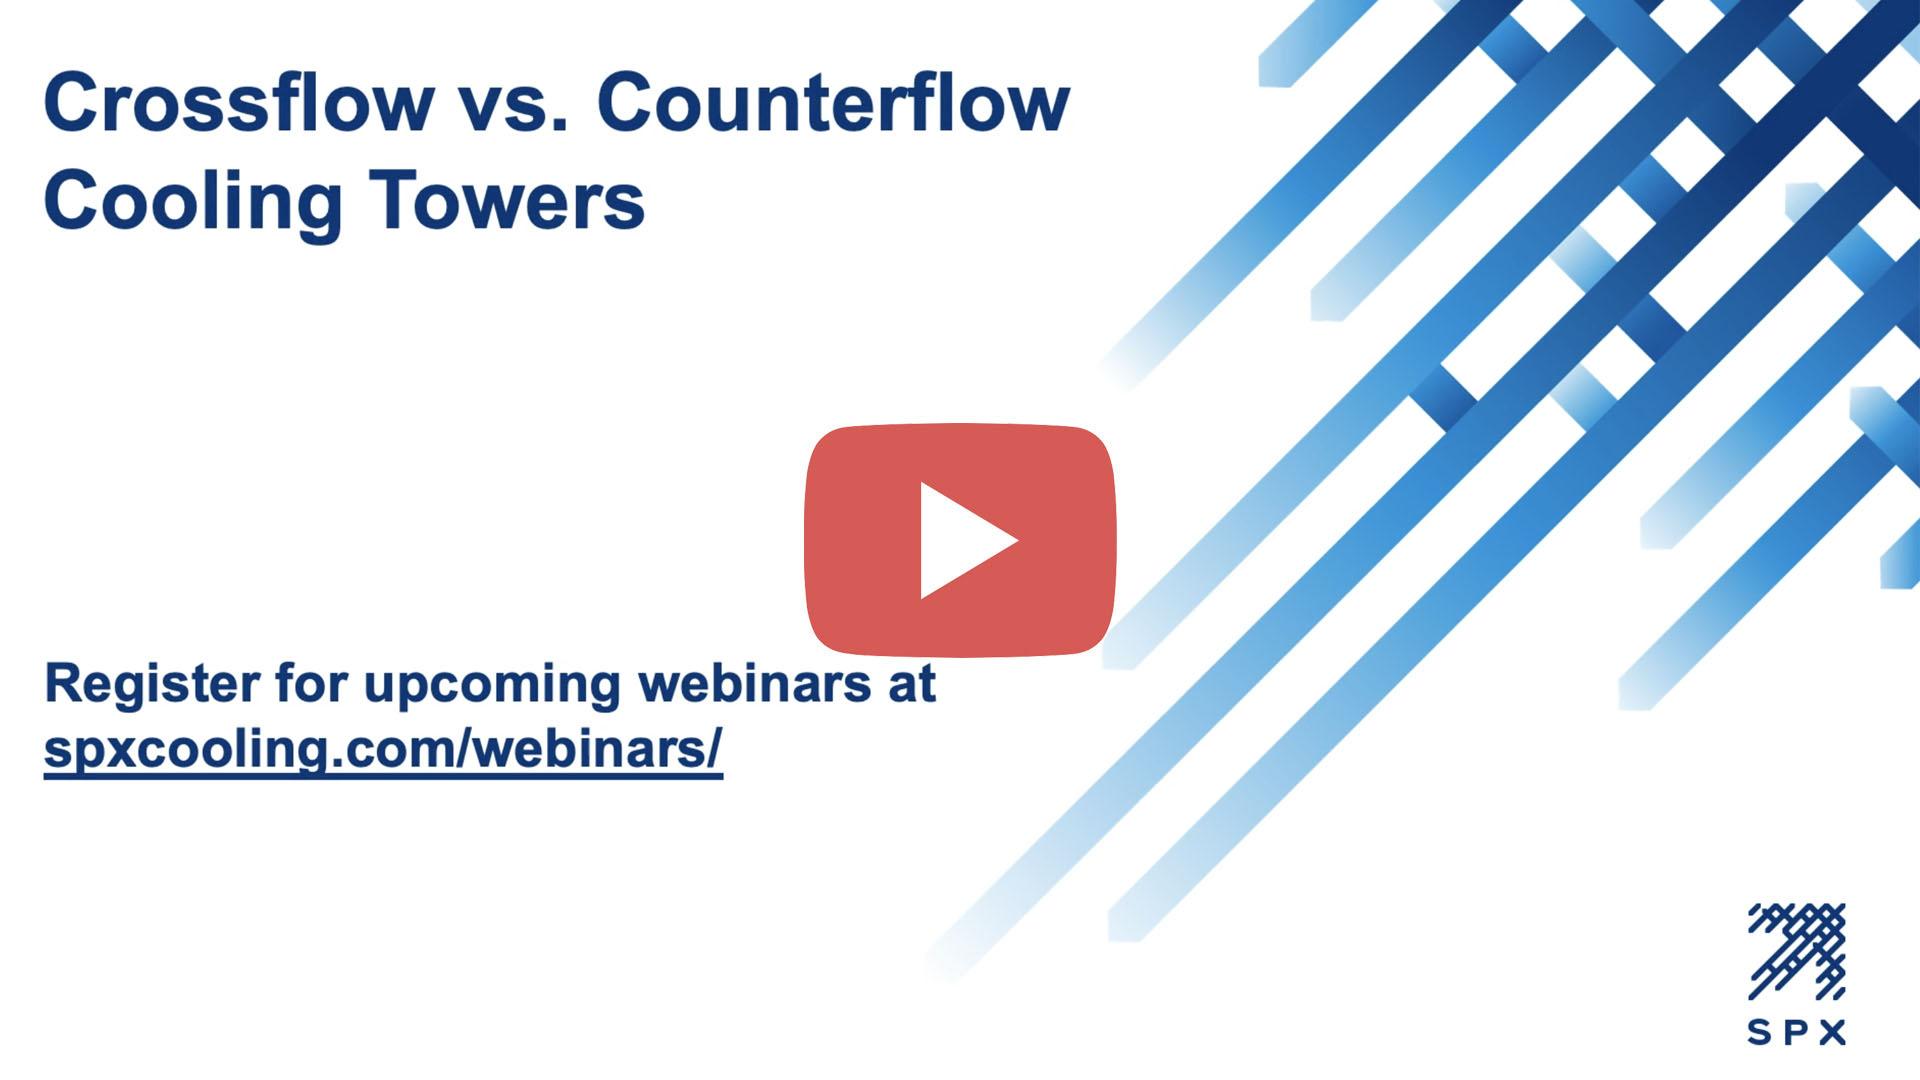 Crossflow Counterflow